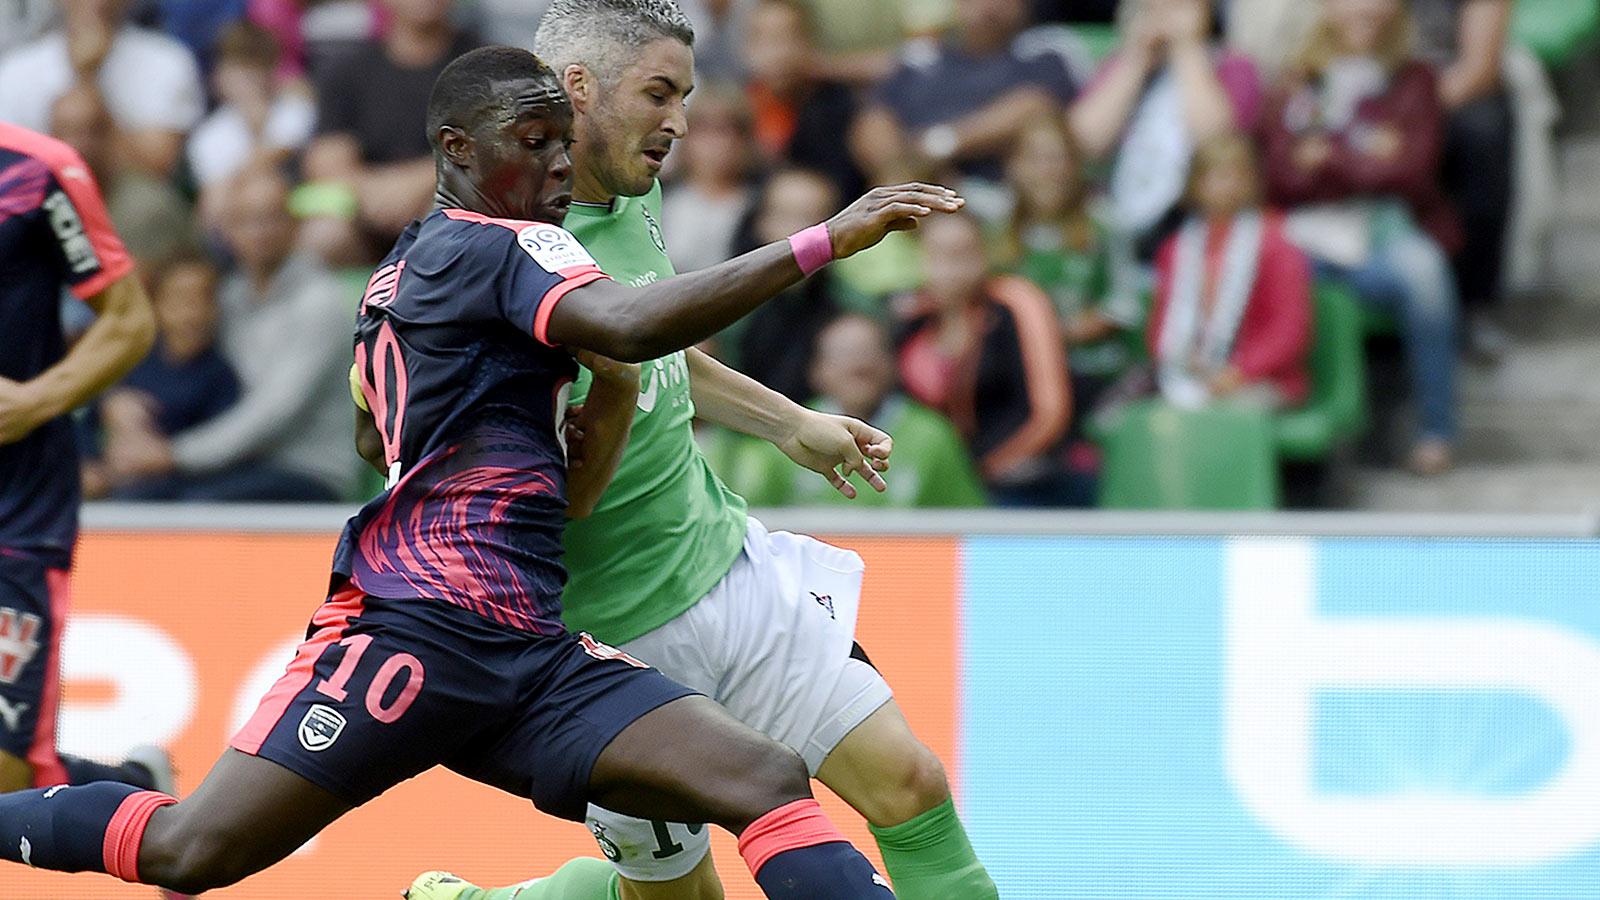 Lyon collect first Ligue 1 win at Guingamp; Bordeaux draw Saint-Etienne